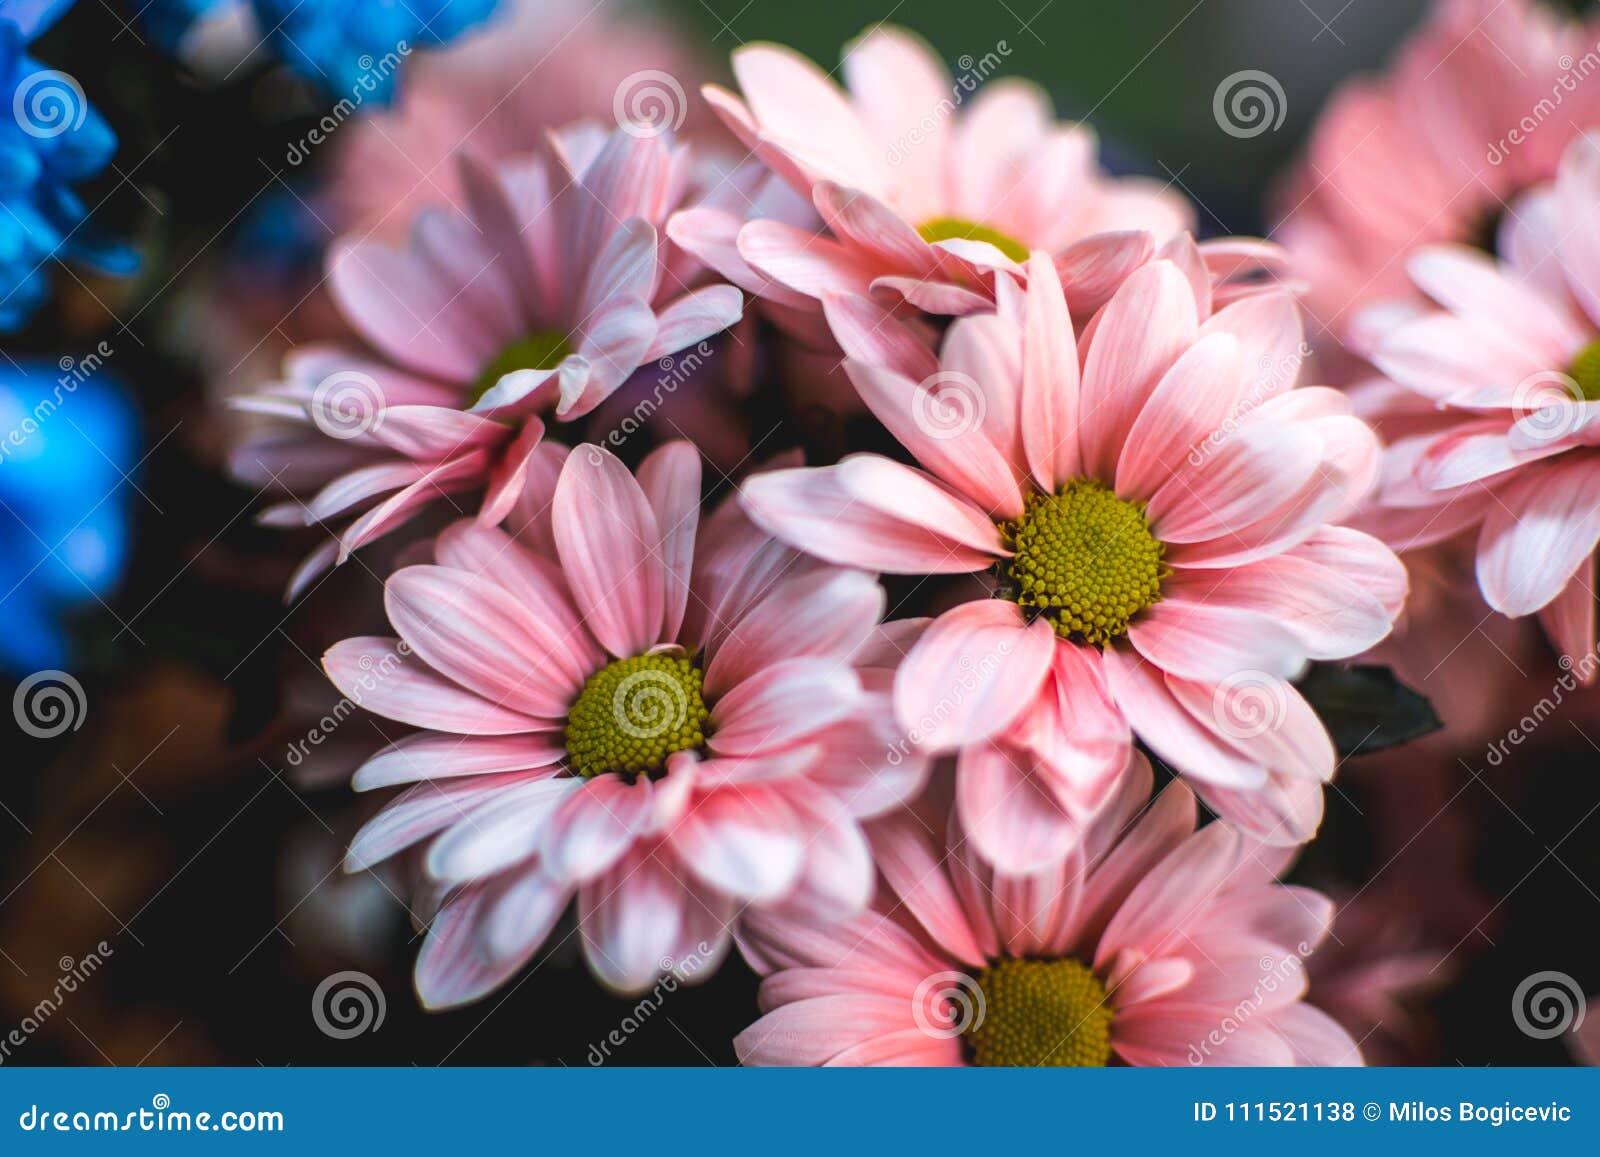 Pink Summer Flowers Margarita Romantic Flower Stock Photo Image